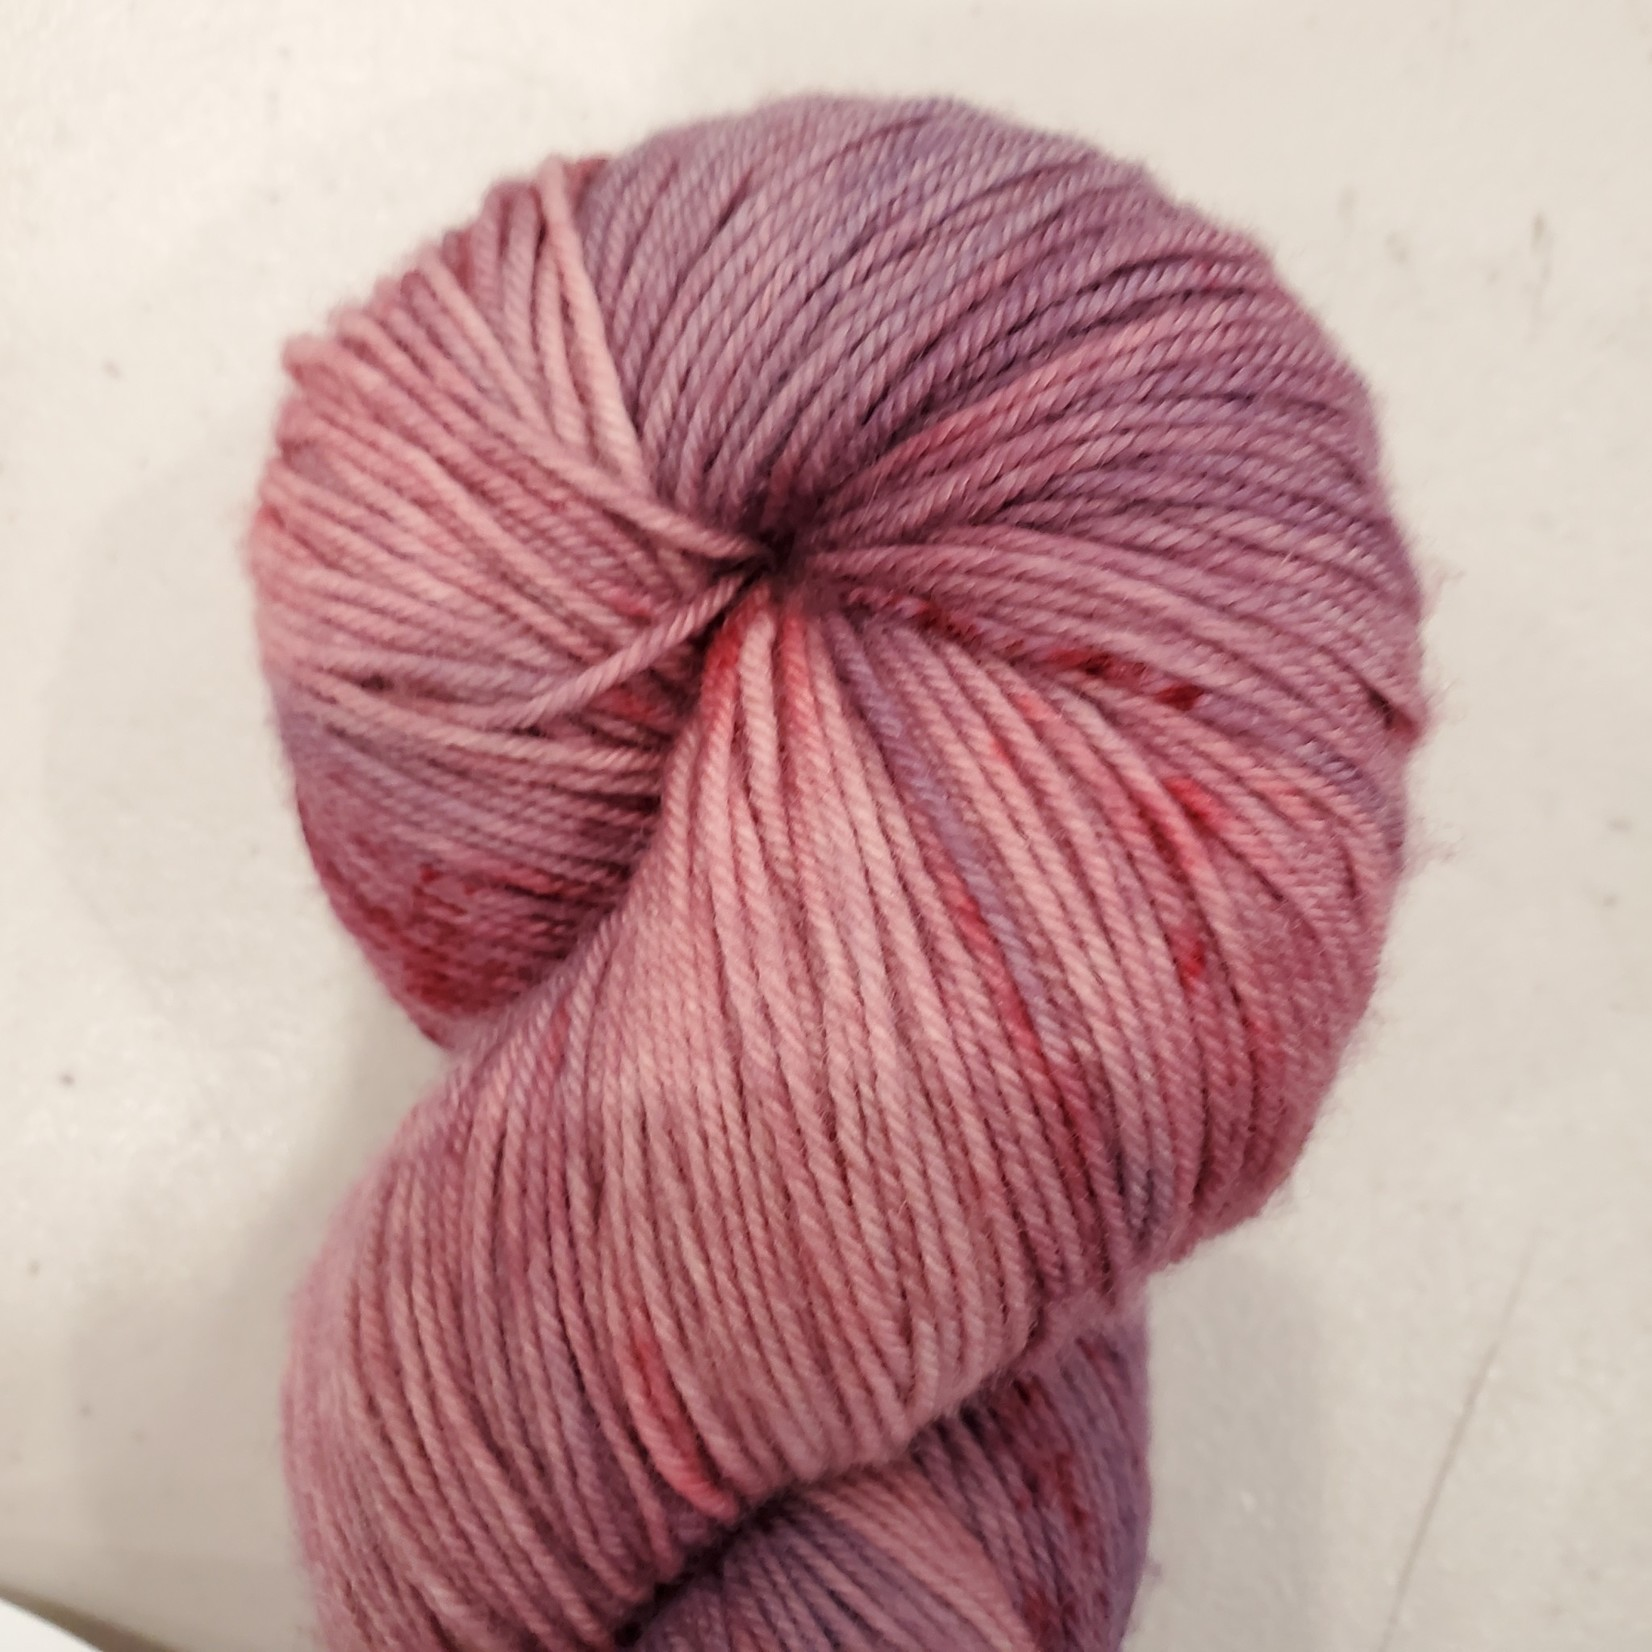 Knit Girl Yarns 4-ply sock ~